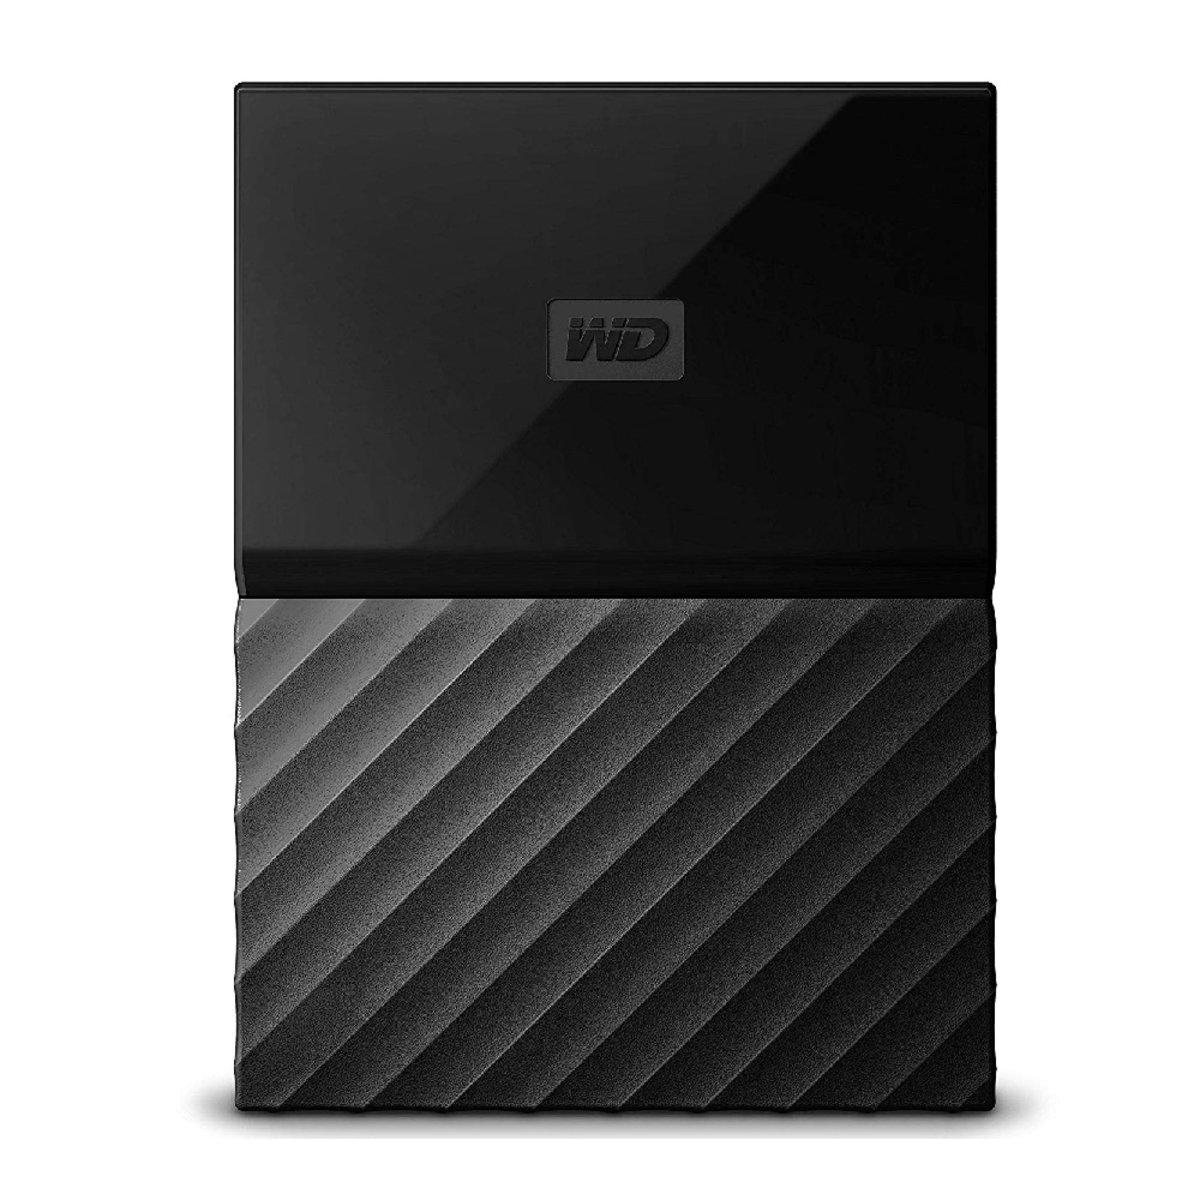 "2.5"" MY PASSPORT 2TB -BLACK (WDBS4B0020BBK)"